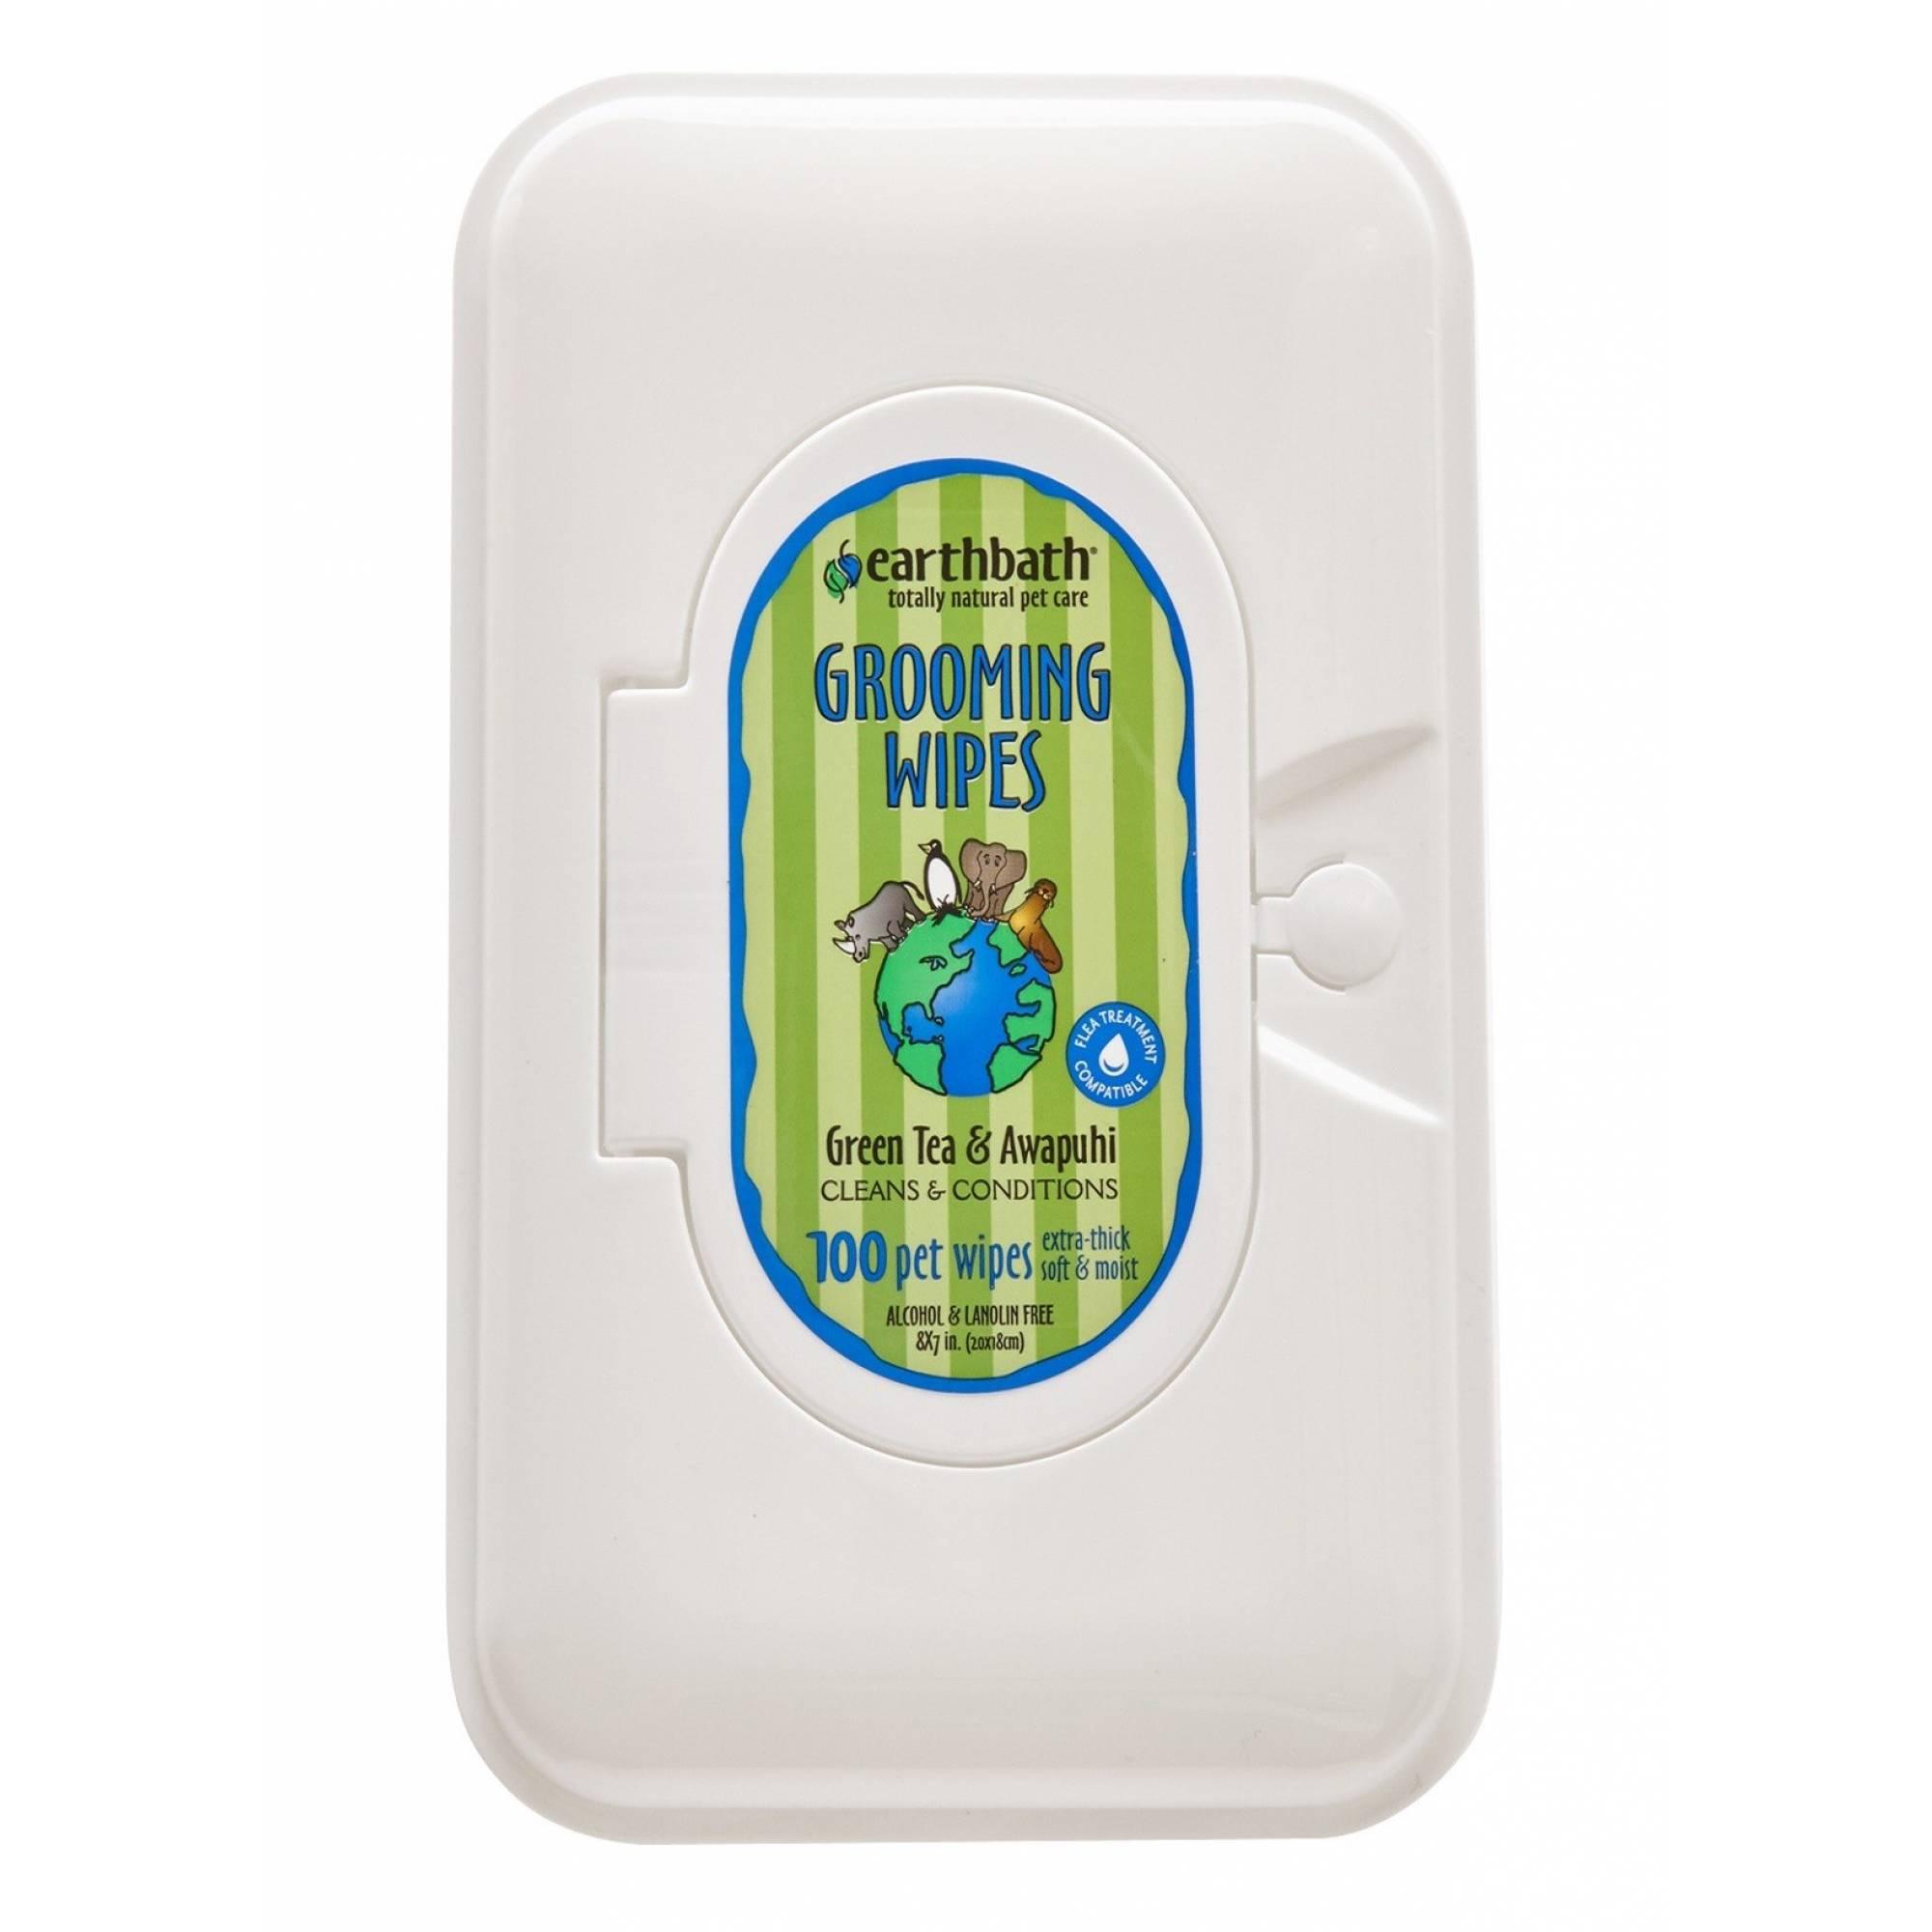 Earthbath EB036 Green Tea with Awapuhi Grooming Cat Wipes 100pcs